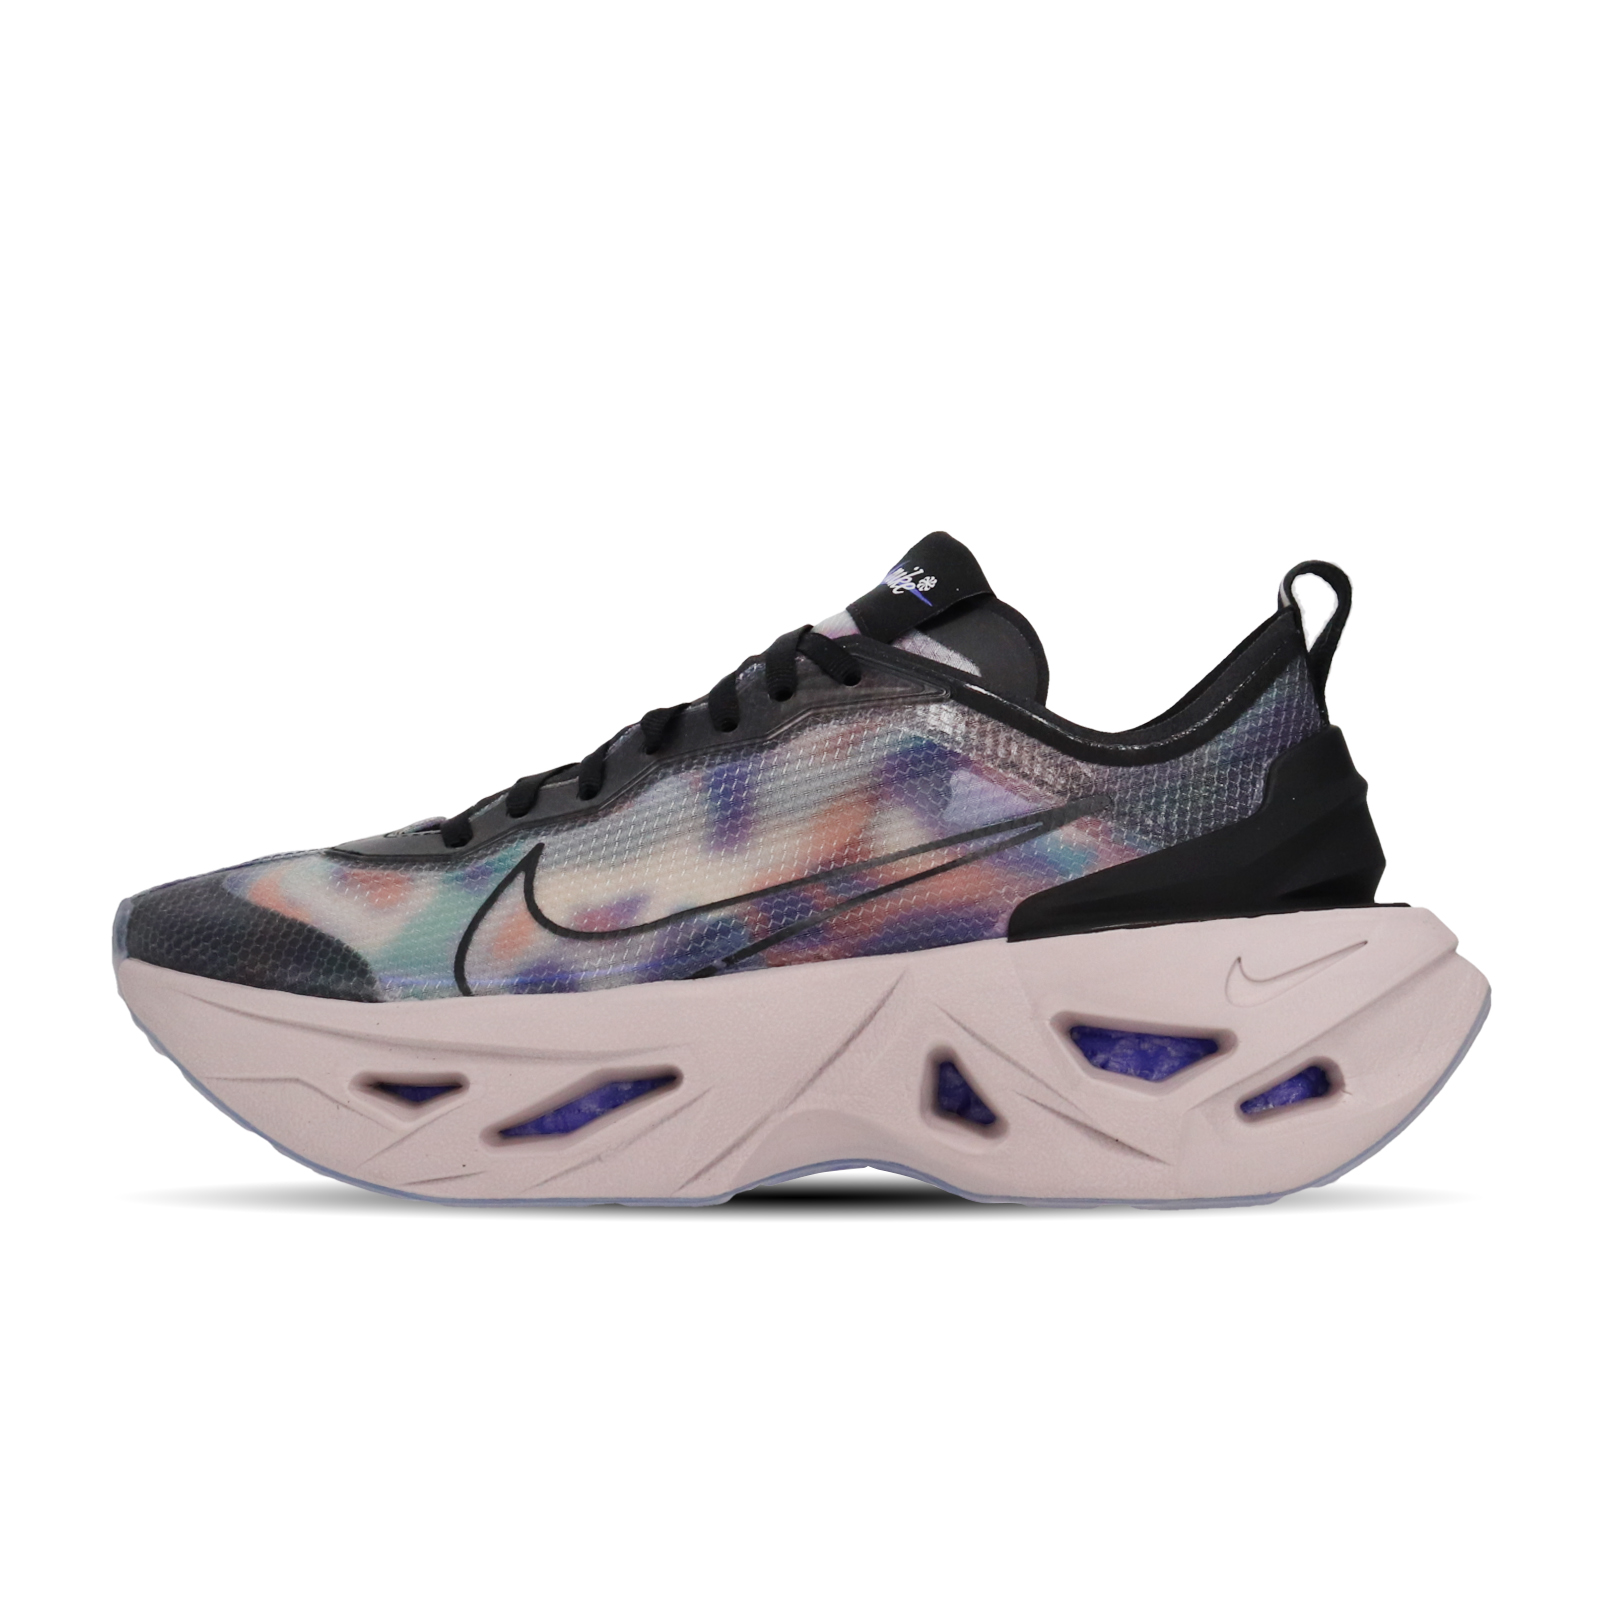 Nike 休閒鞋 Wmns ZoomX Vista Grind SP 黑 紫 女鞋 厚底【ACS】 CT5770-001